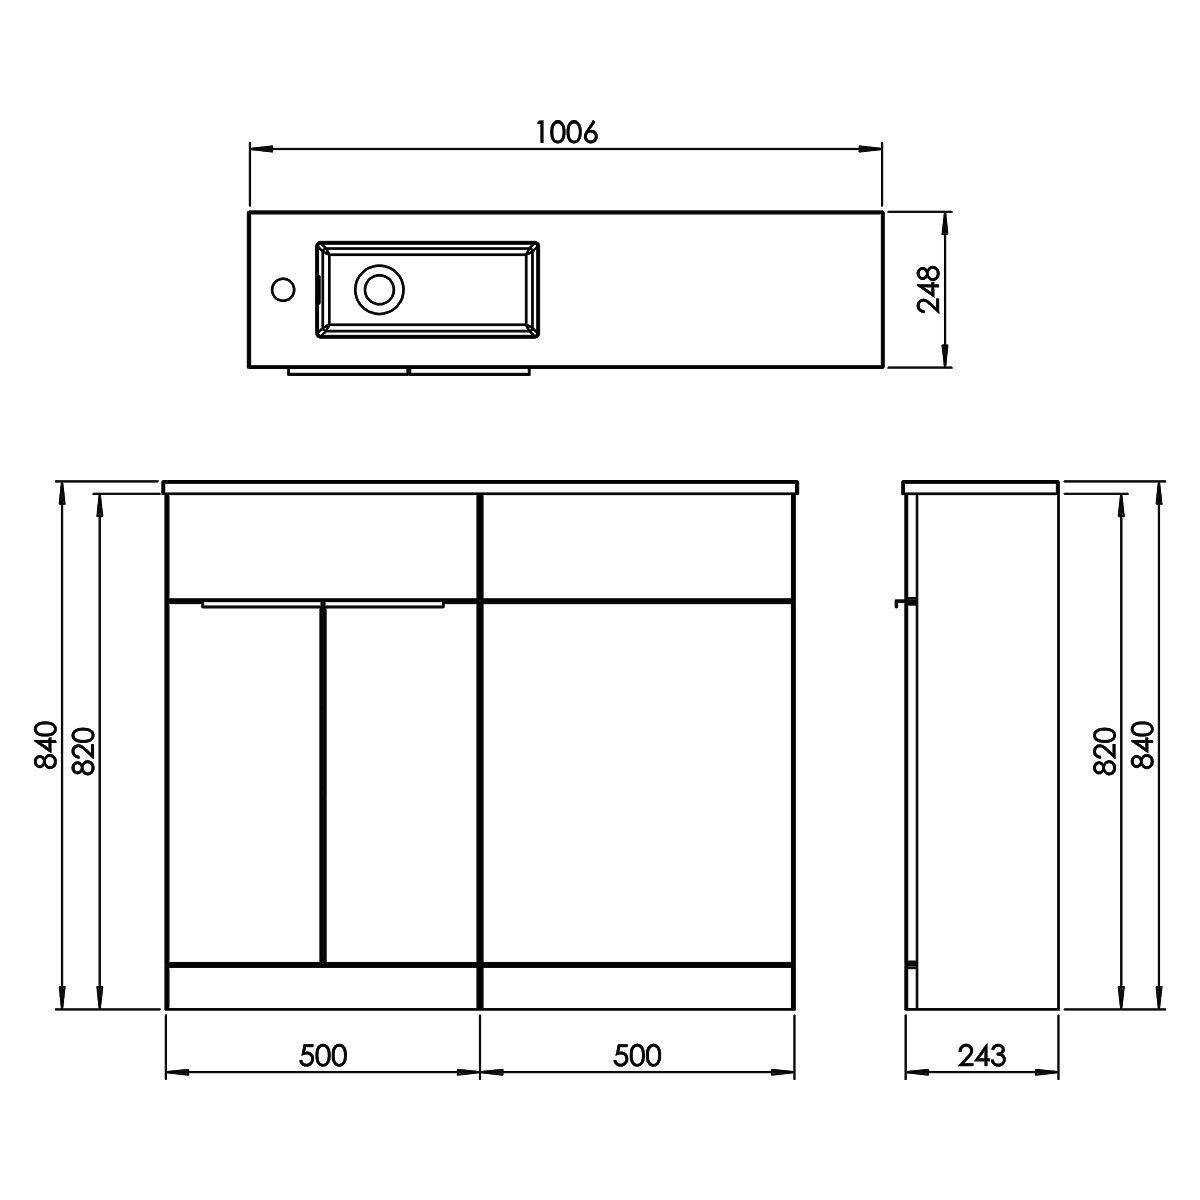 Elation Combination Straight Pearl Grey Matt Furniture Pack 1000mm Dimensions